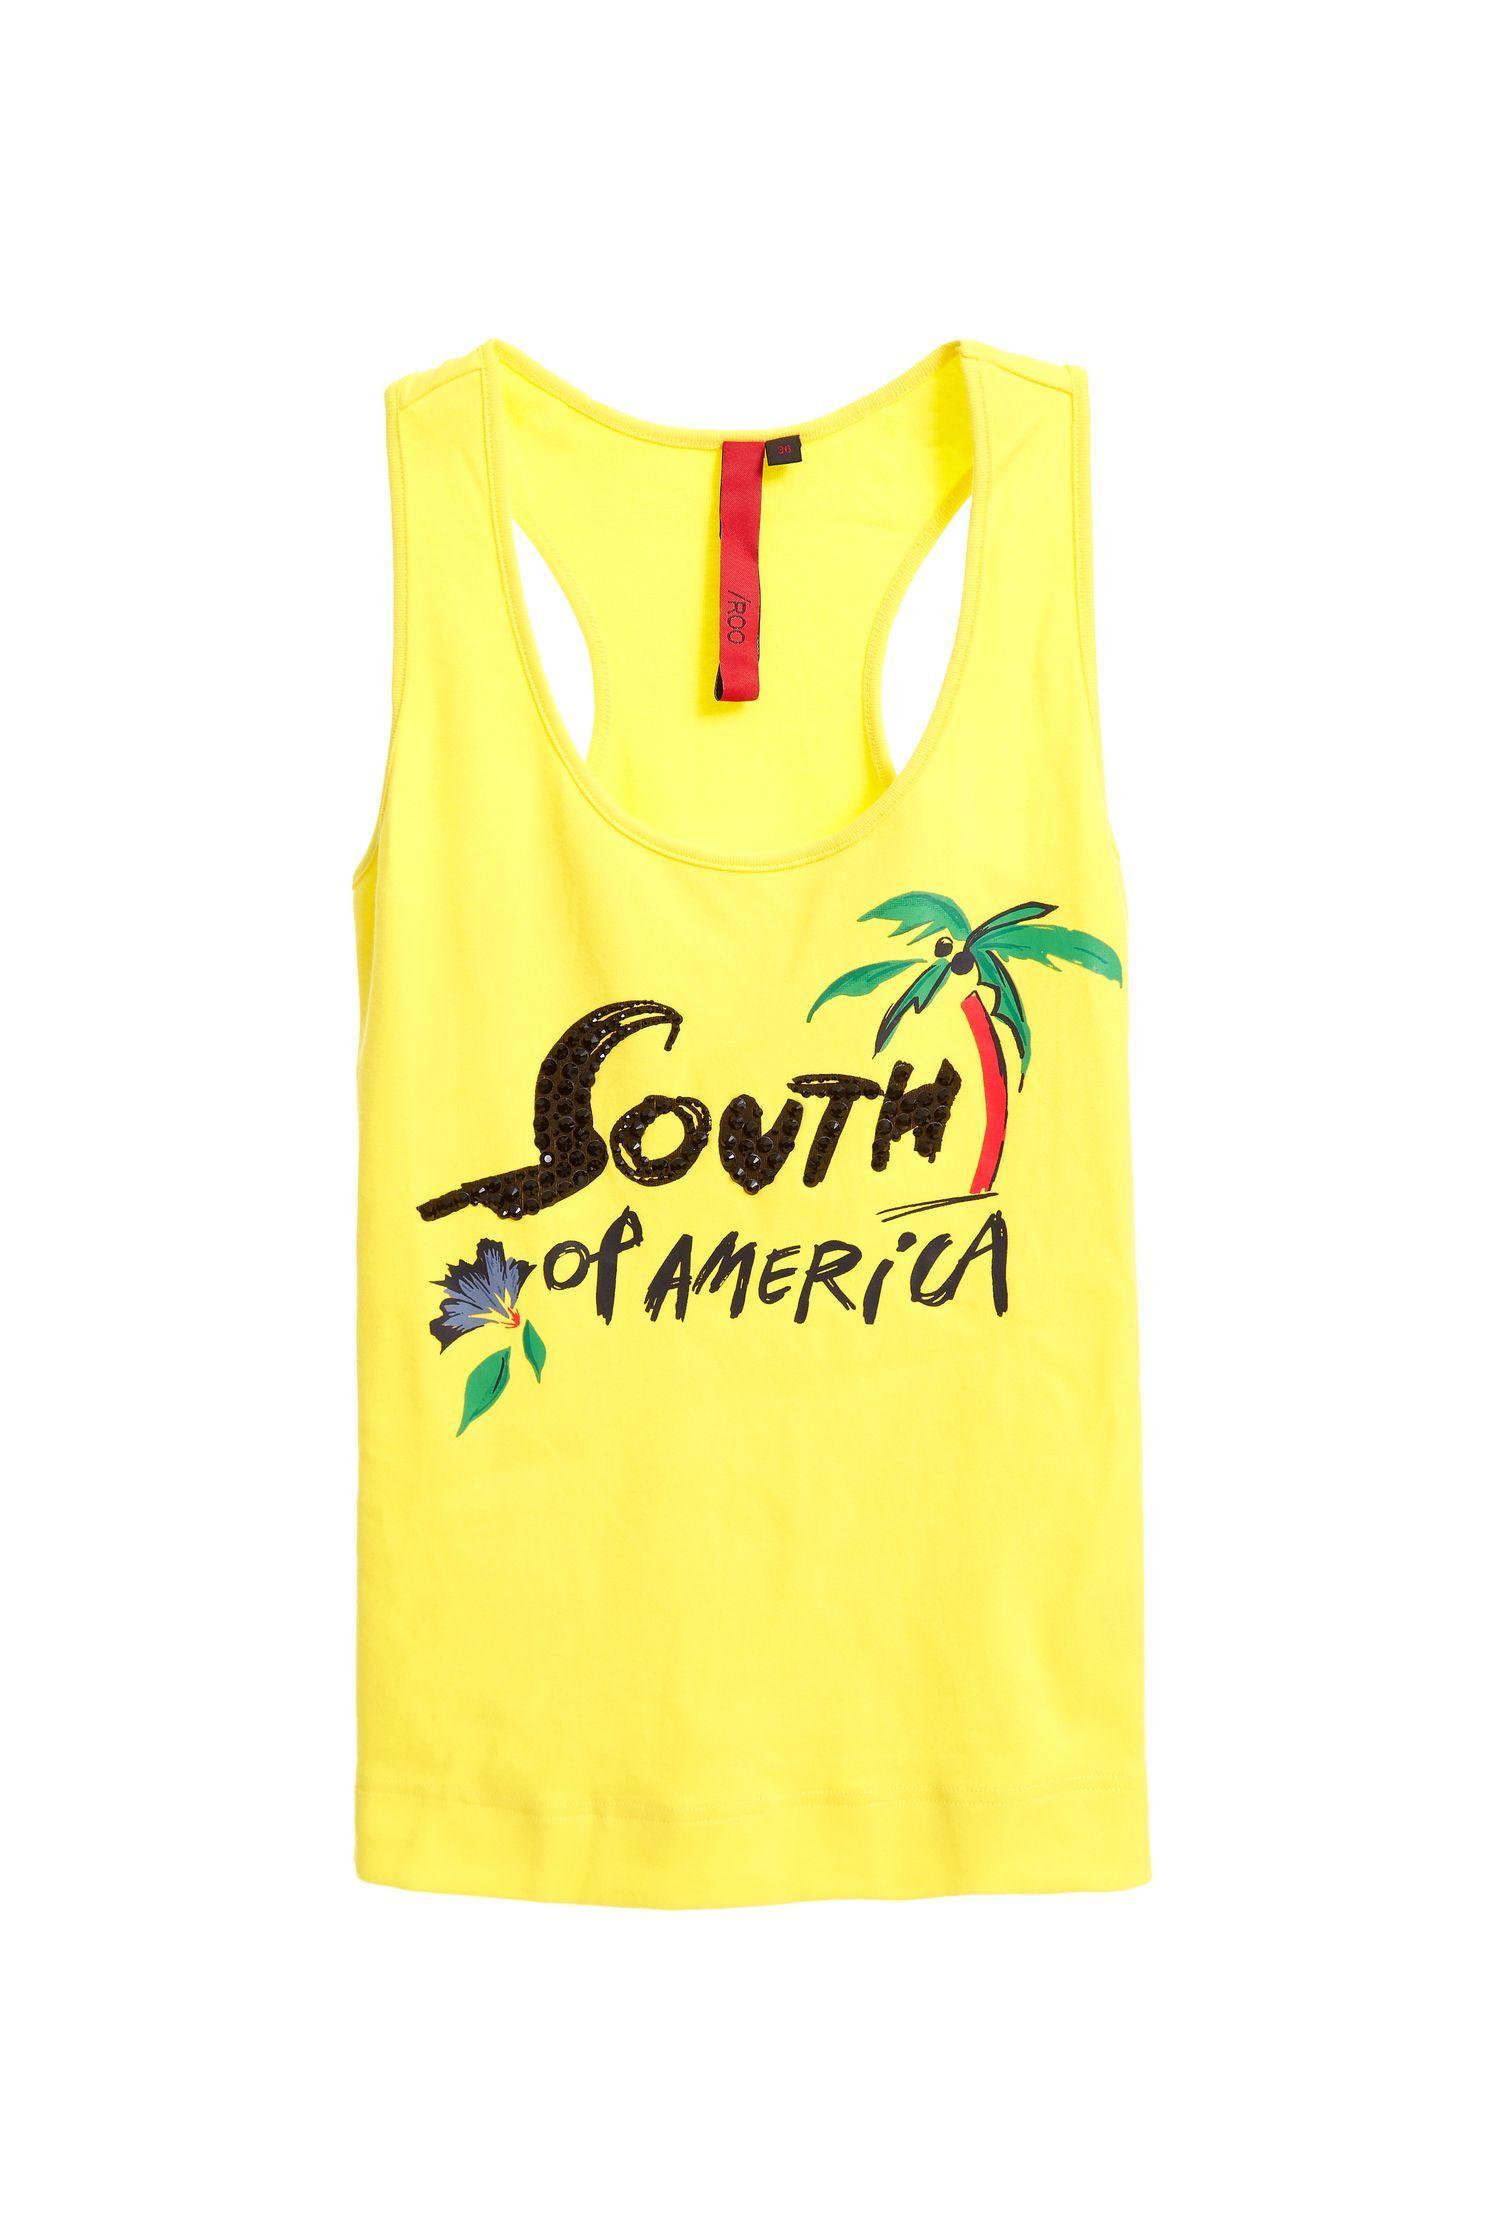 South American style cotton vest